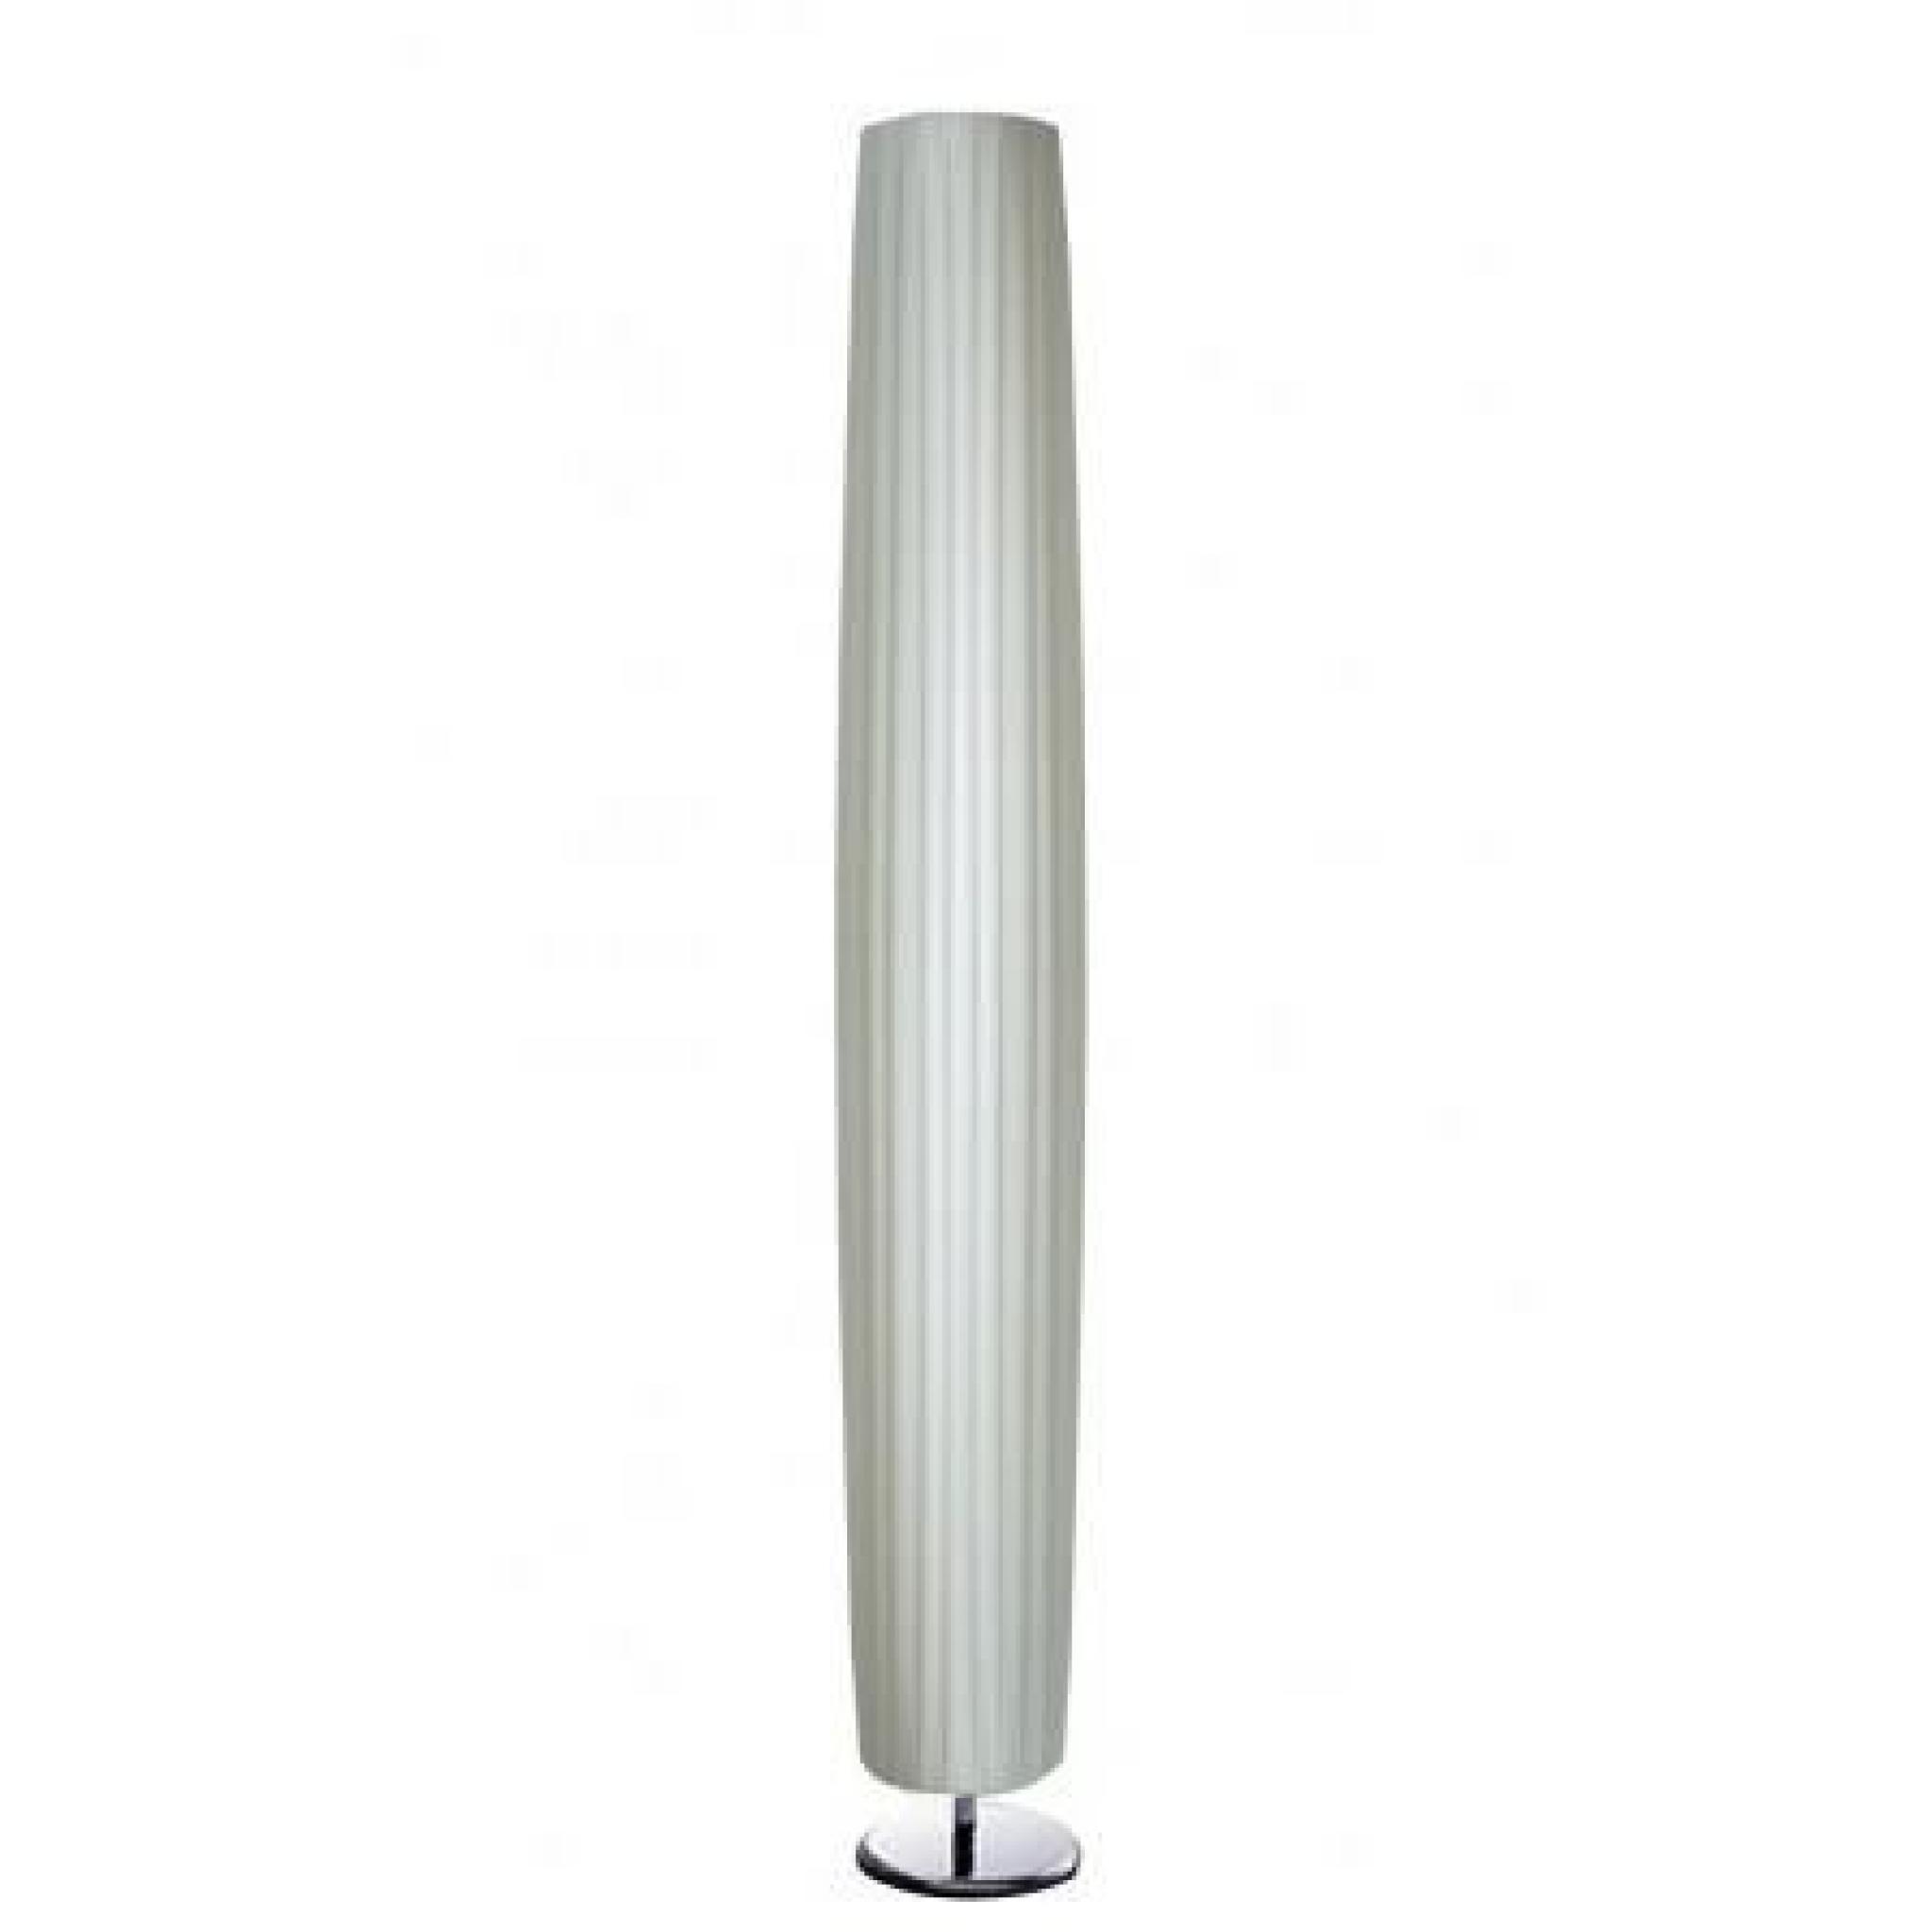 Lampadaire Blanc En Tissu Et Metal Chrome Hau Achat Vente